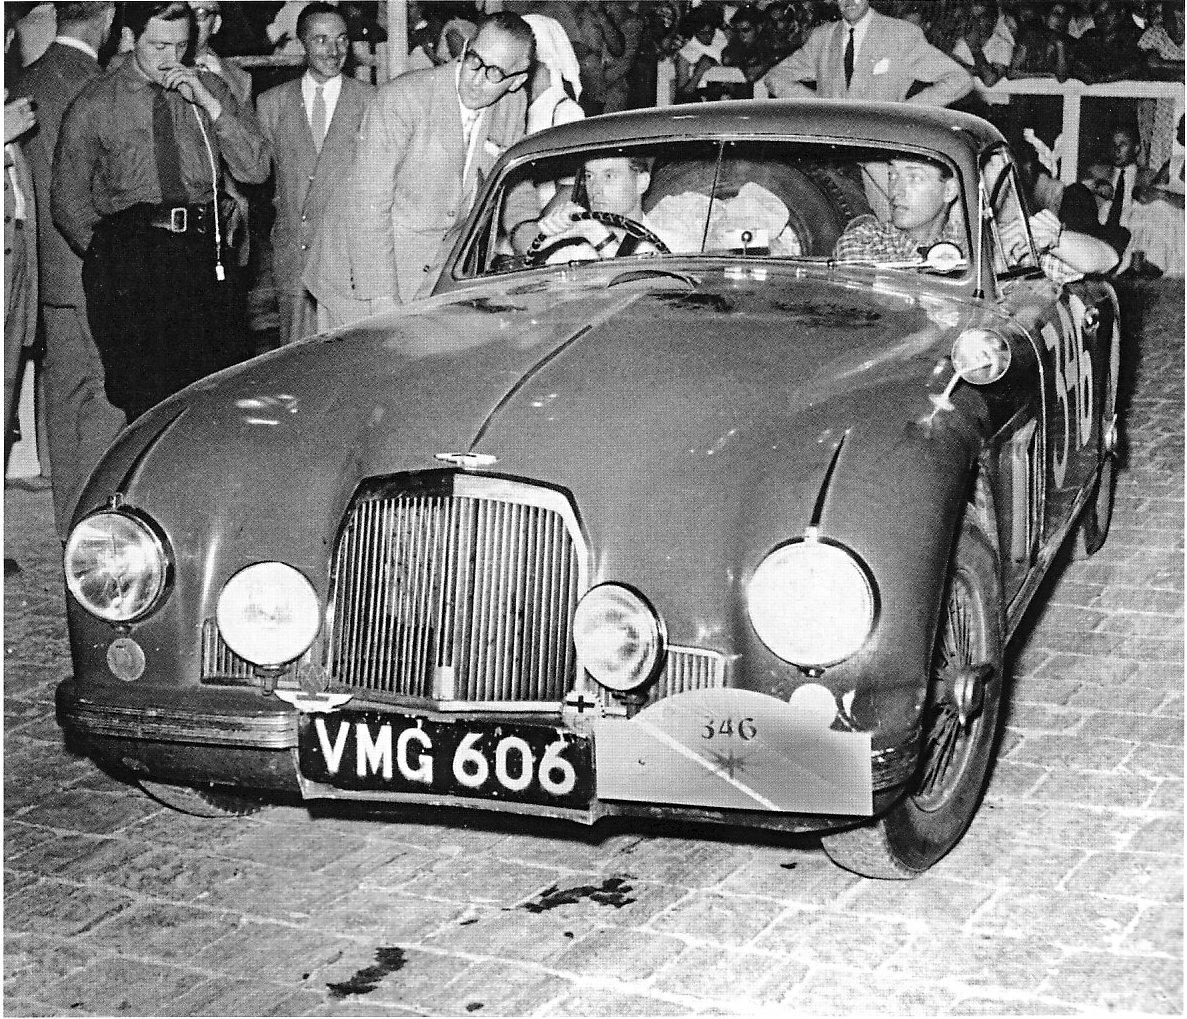 Godsall  Aston Martin DB2 at 1952 Coupe des Alpes - Rally Car Photo Print